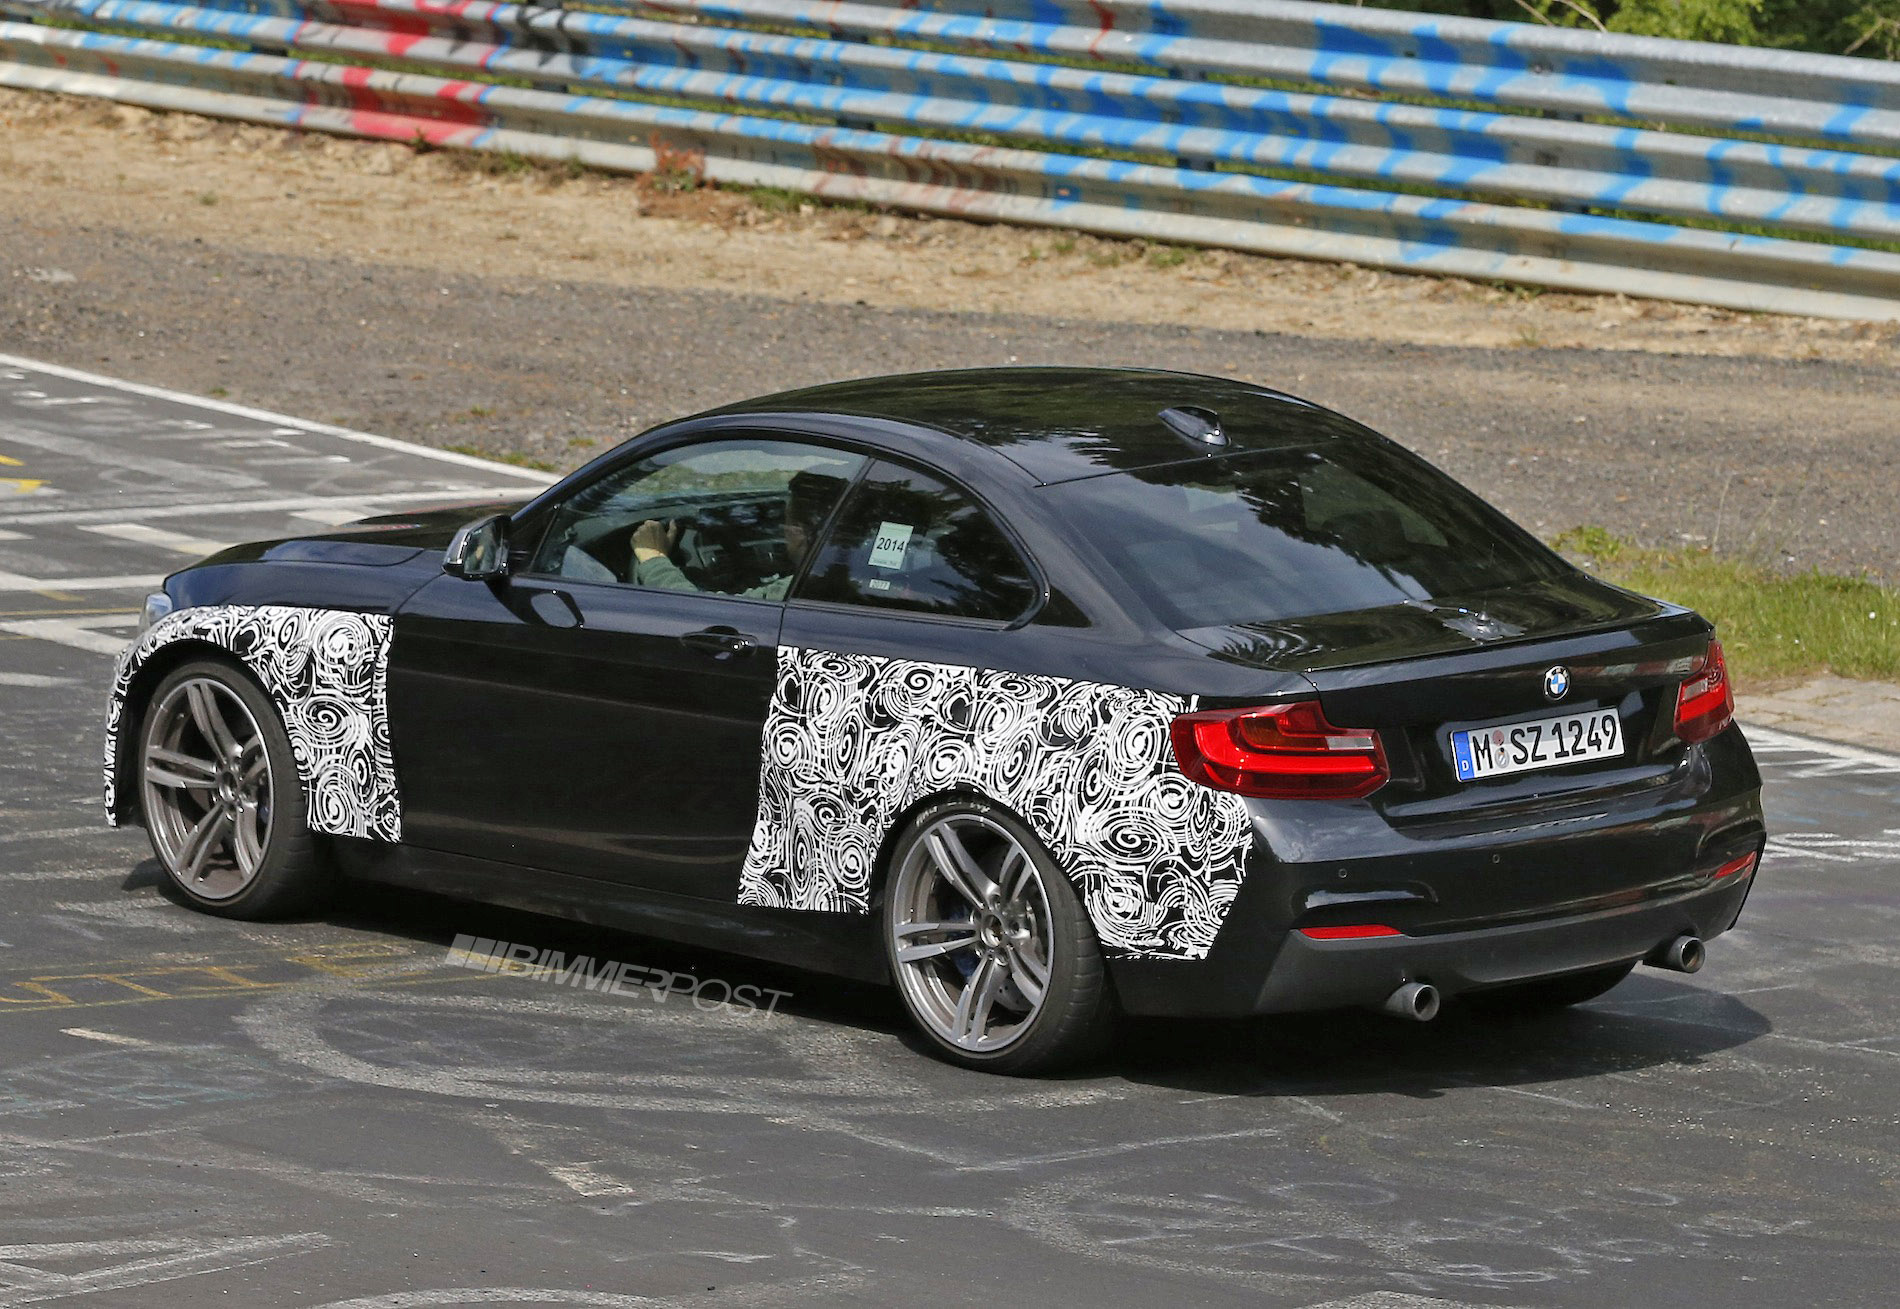 2016 - [BMW] M2 [F87] - Page 3 M2%20Ring%206